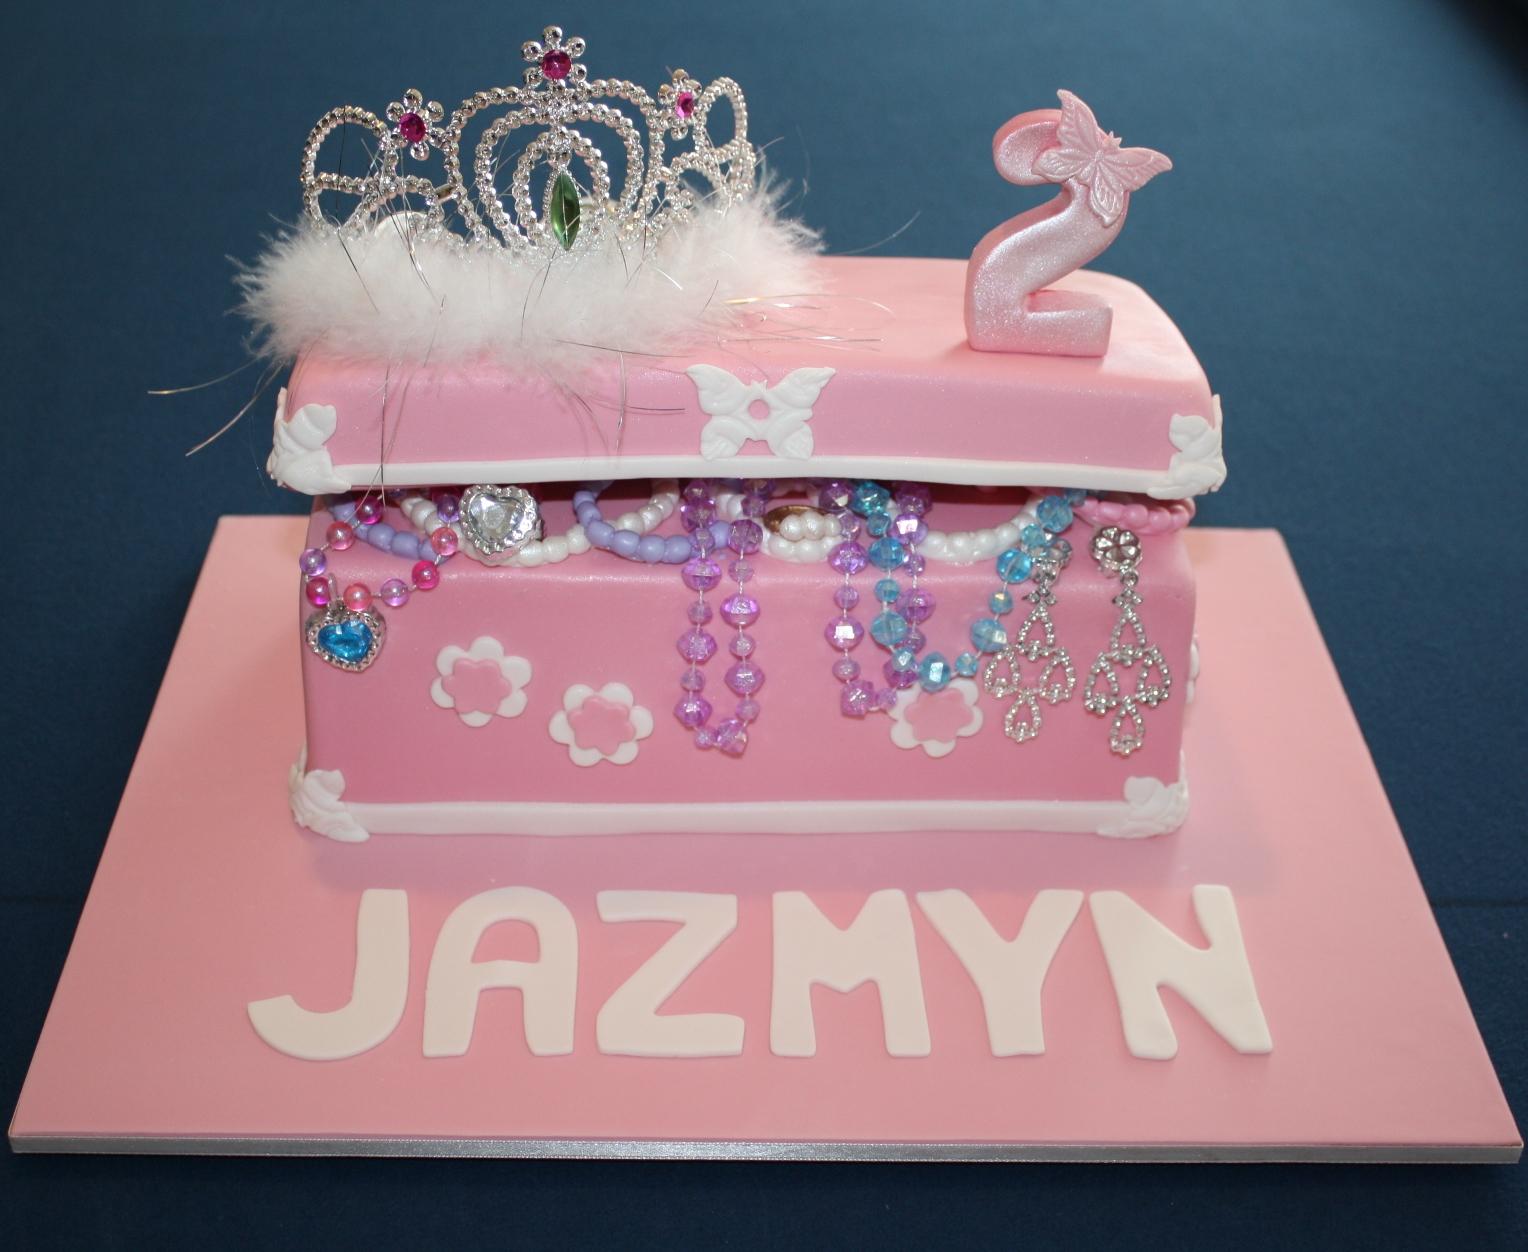 Sandys Cakes Jazmyns Jewellery Box